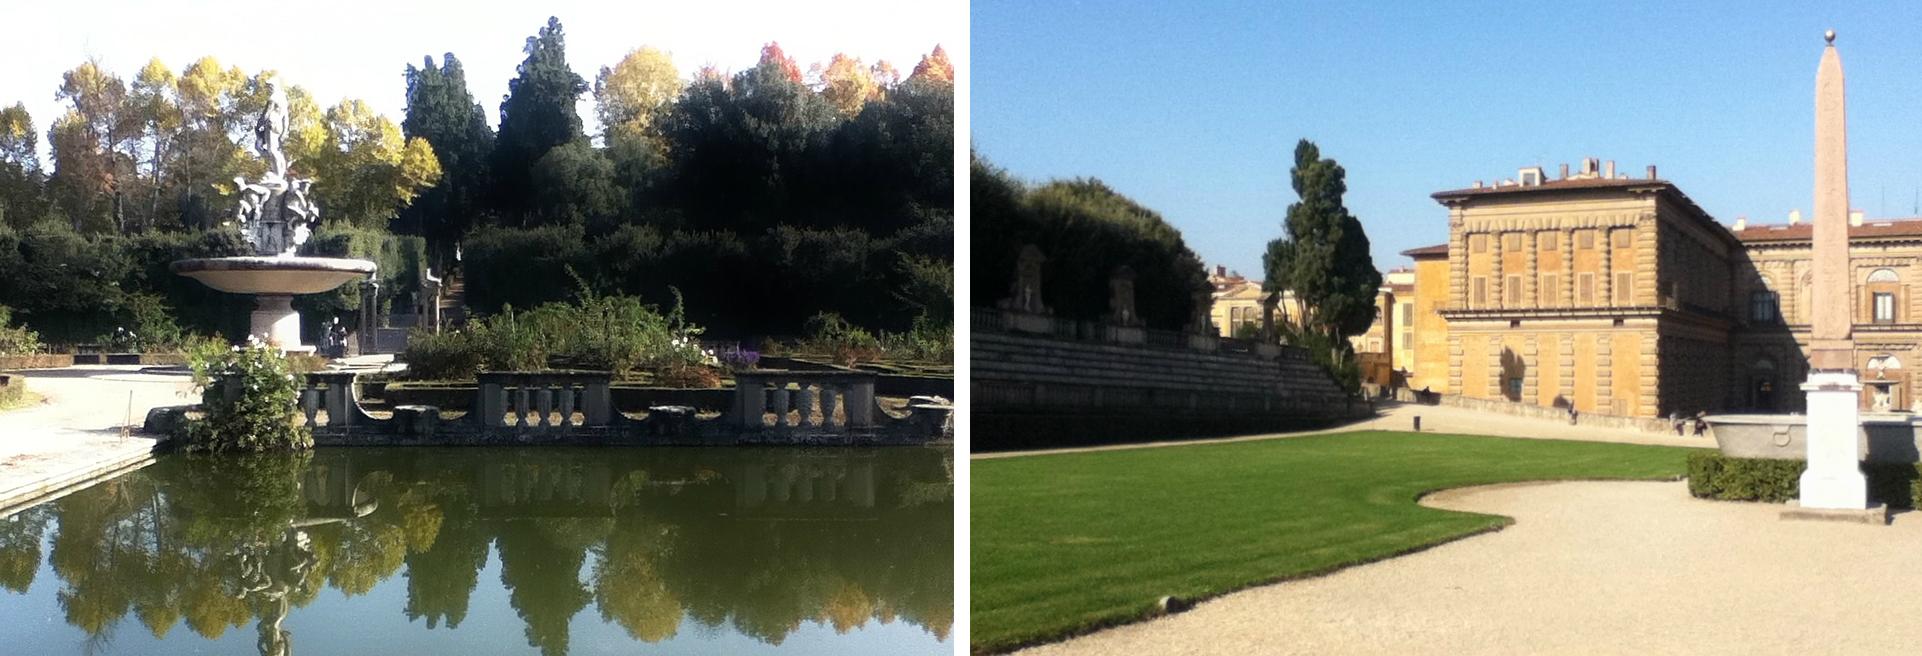 Italy - Florence - Boboli Gardens - 3.1